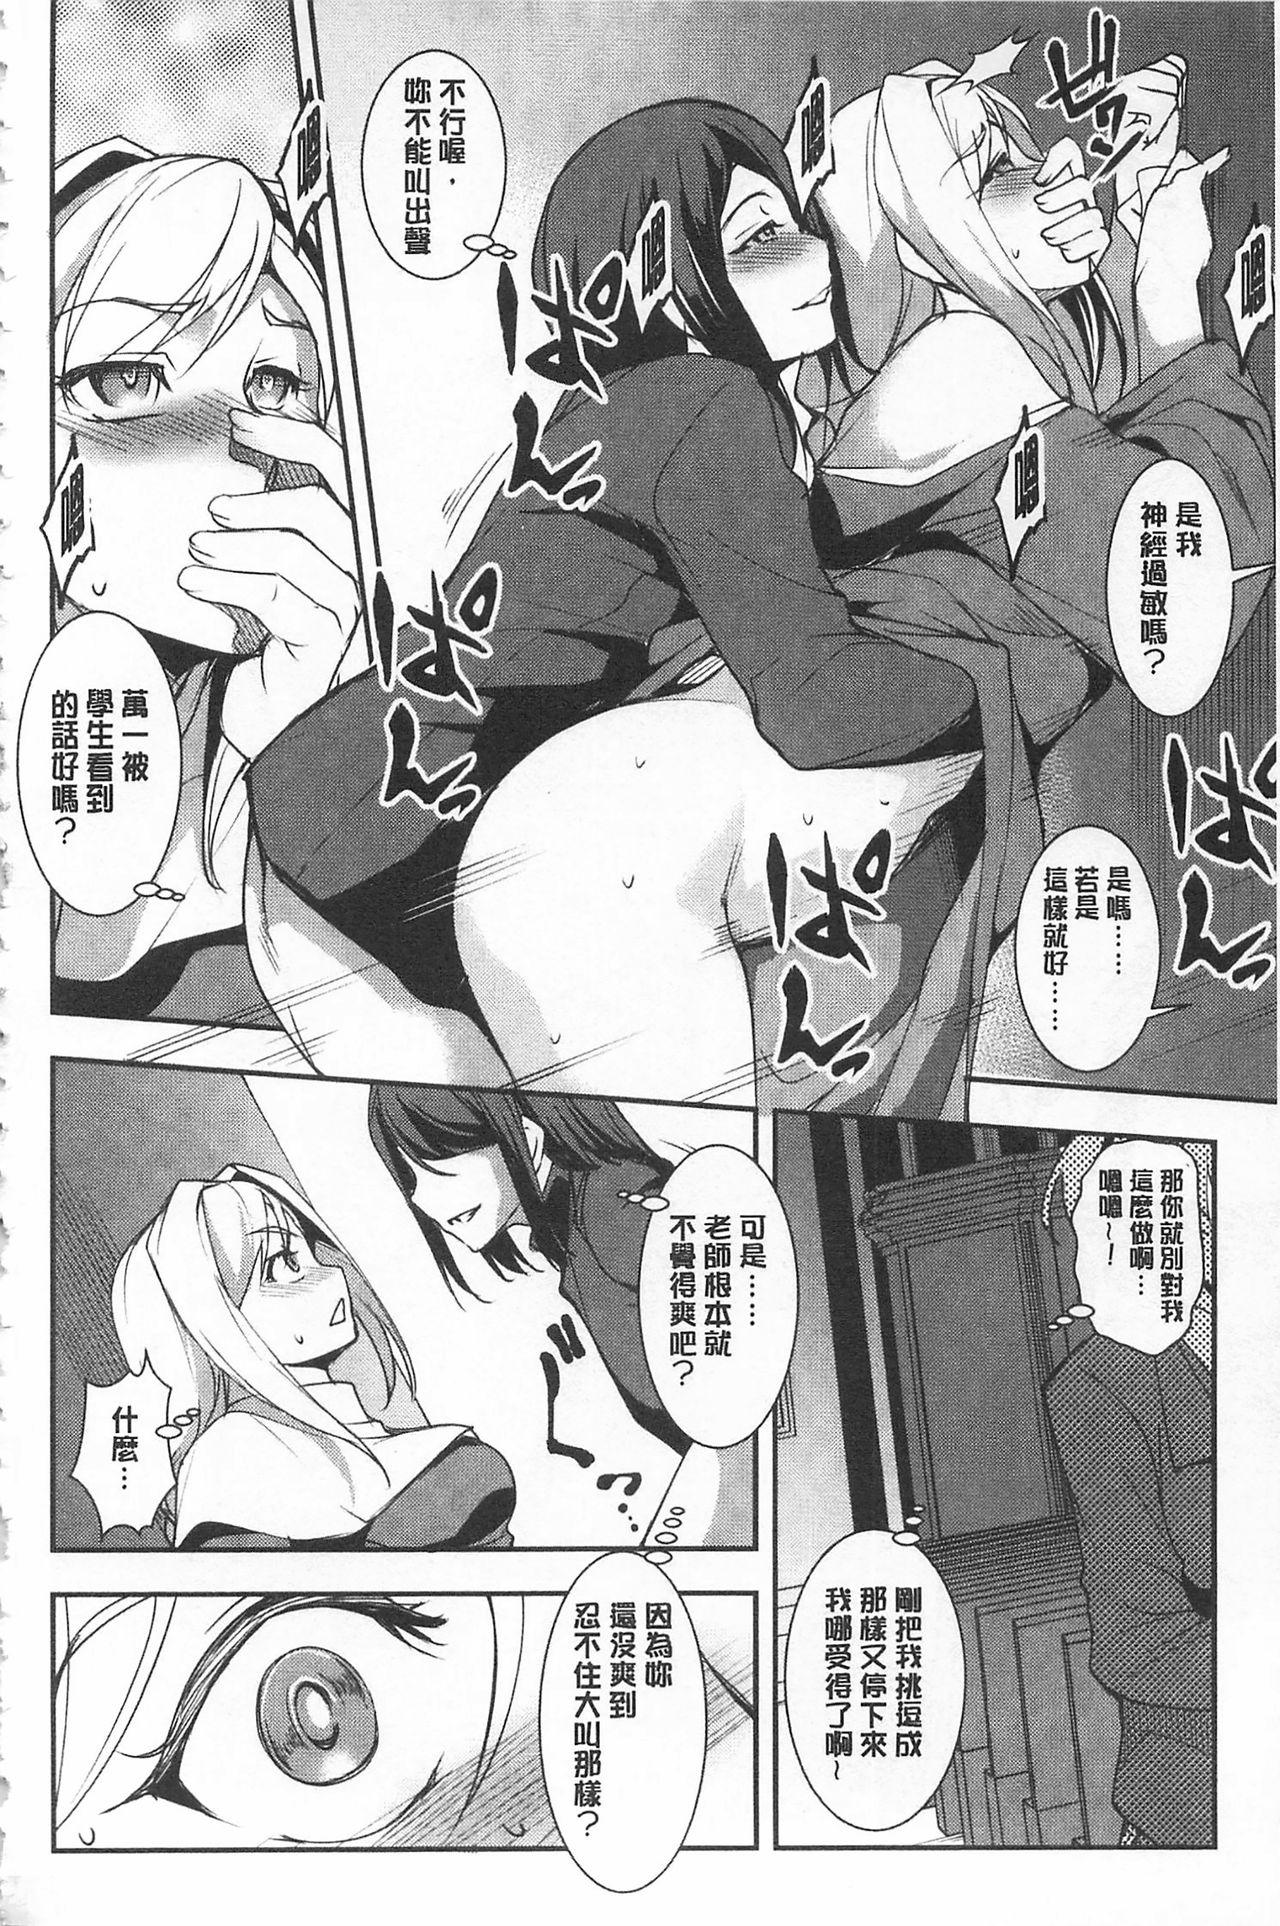 [Amano Kazumi] Seida Inyou -Seijo no Katachi Shita Intou- | 聖墮陰陽 -聖女的容貌與淫蕩- [Chinese] 77